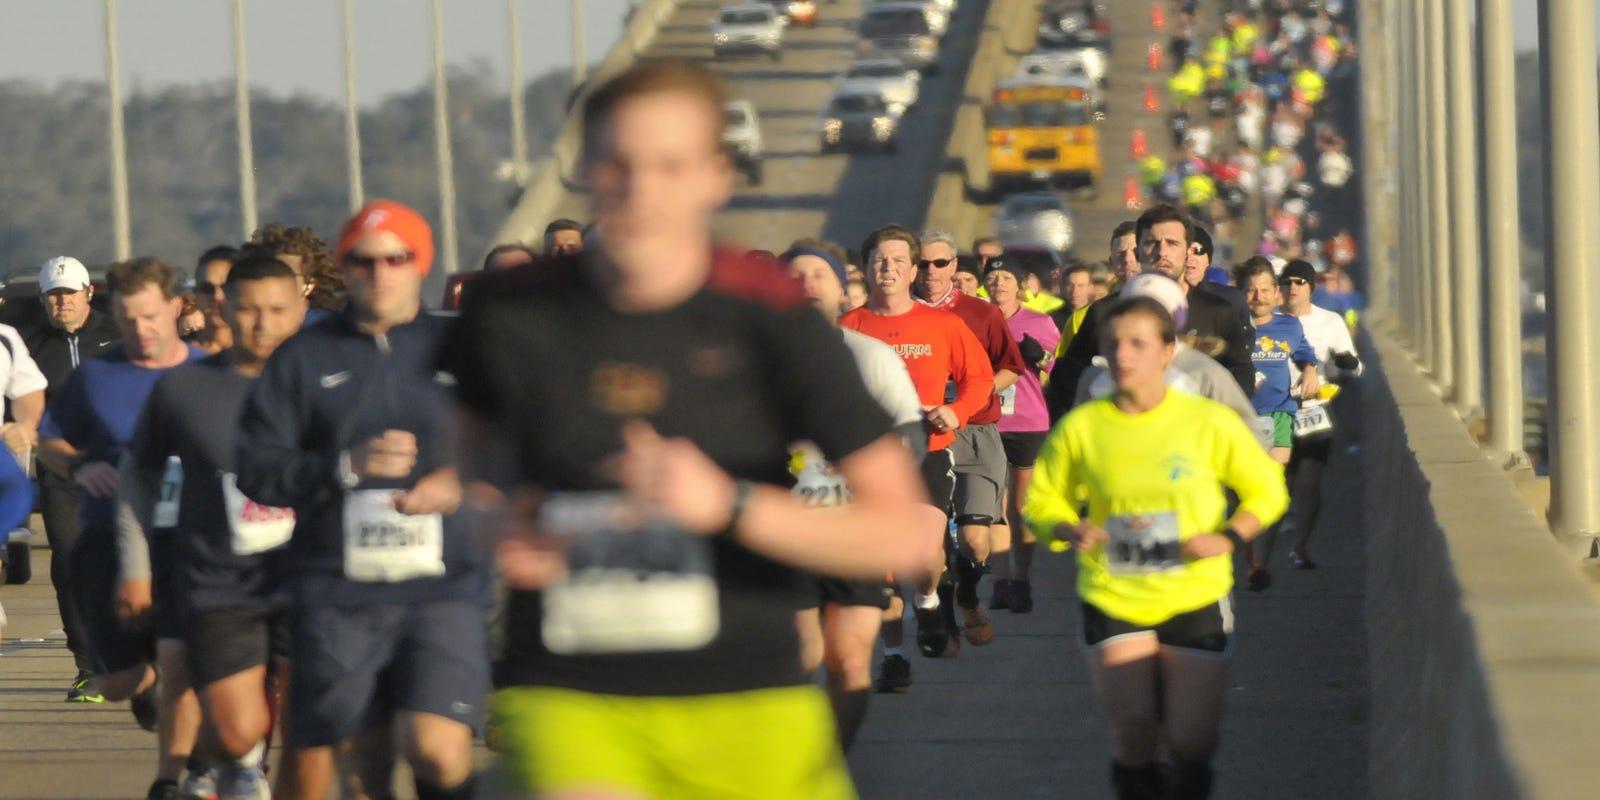 Pensacola Double Bridge Run celebrates finality and future